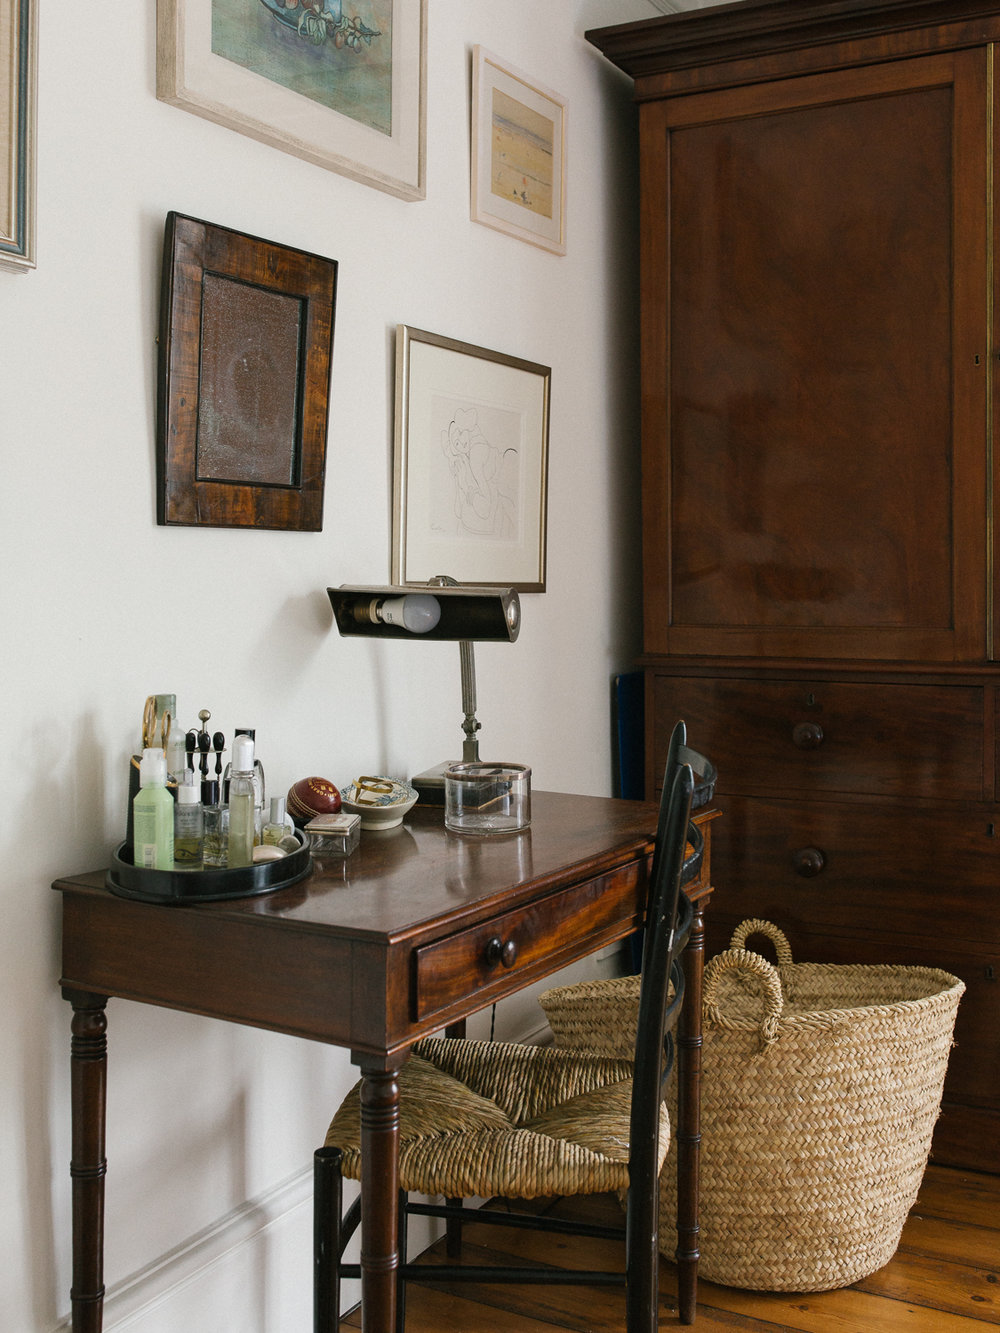 vanity corner - Larkhall Place, Bath